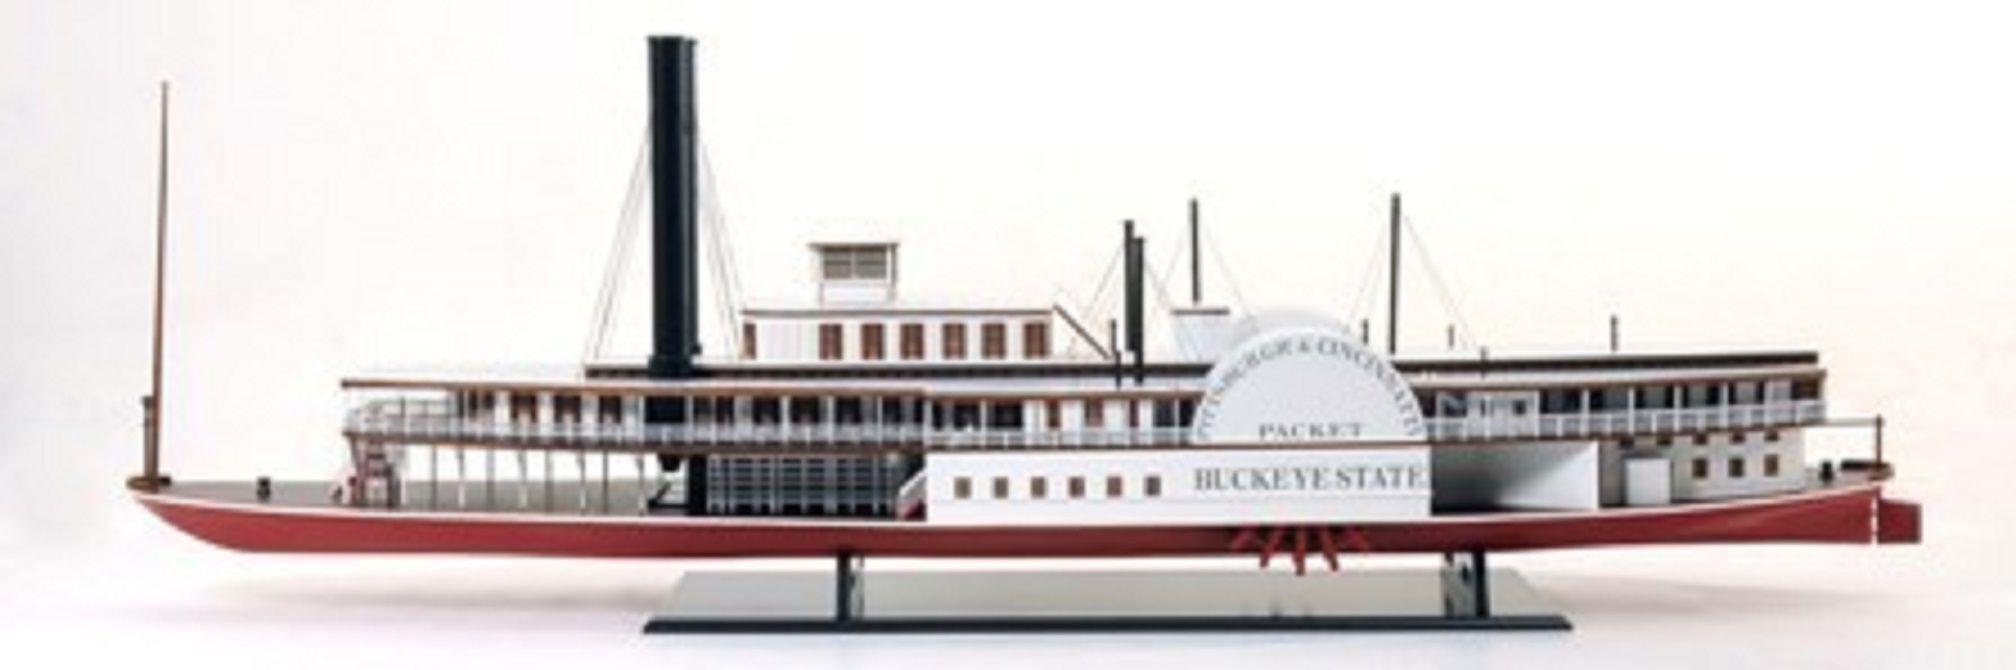 Buckeye Paddle Steamer (Premier Range) - PSM